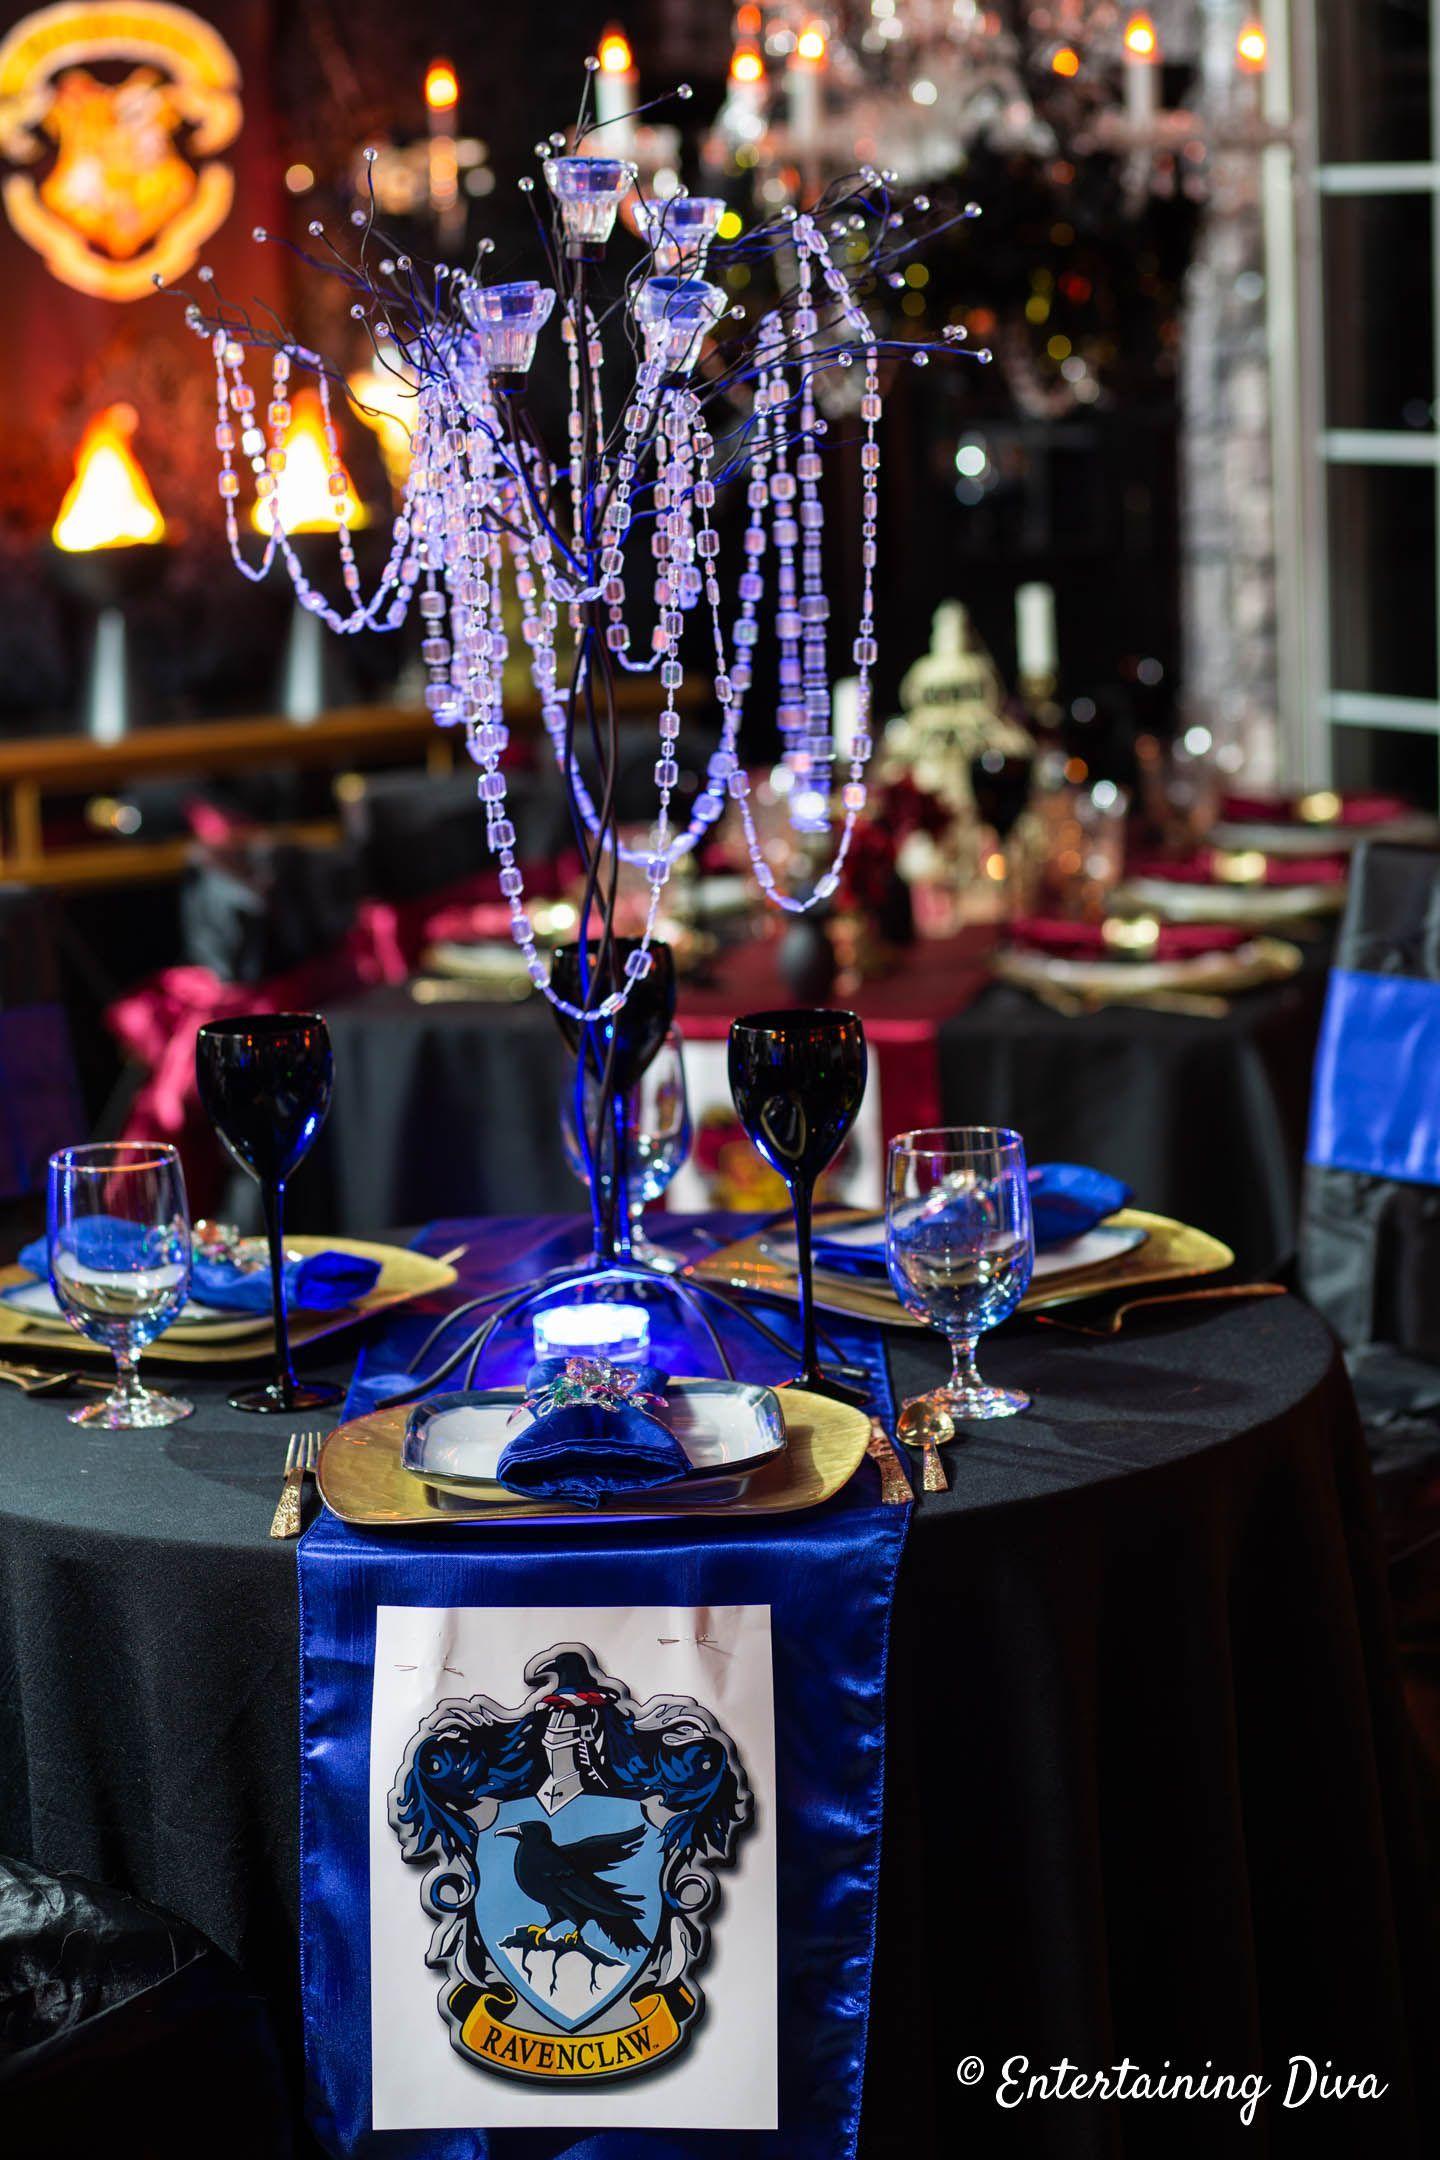 Harry Potter Table Decor Ideas Entertaining Diva From House To Home Harry Potter Table Harry Potter Party Harry Potter Decor